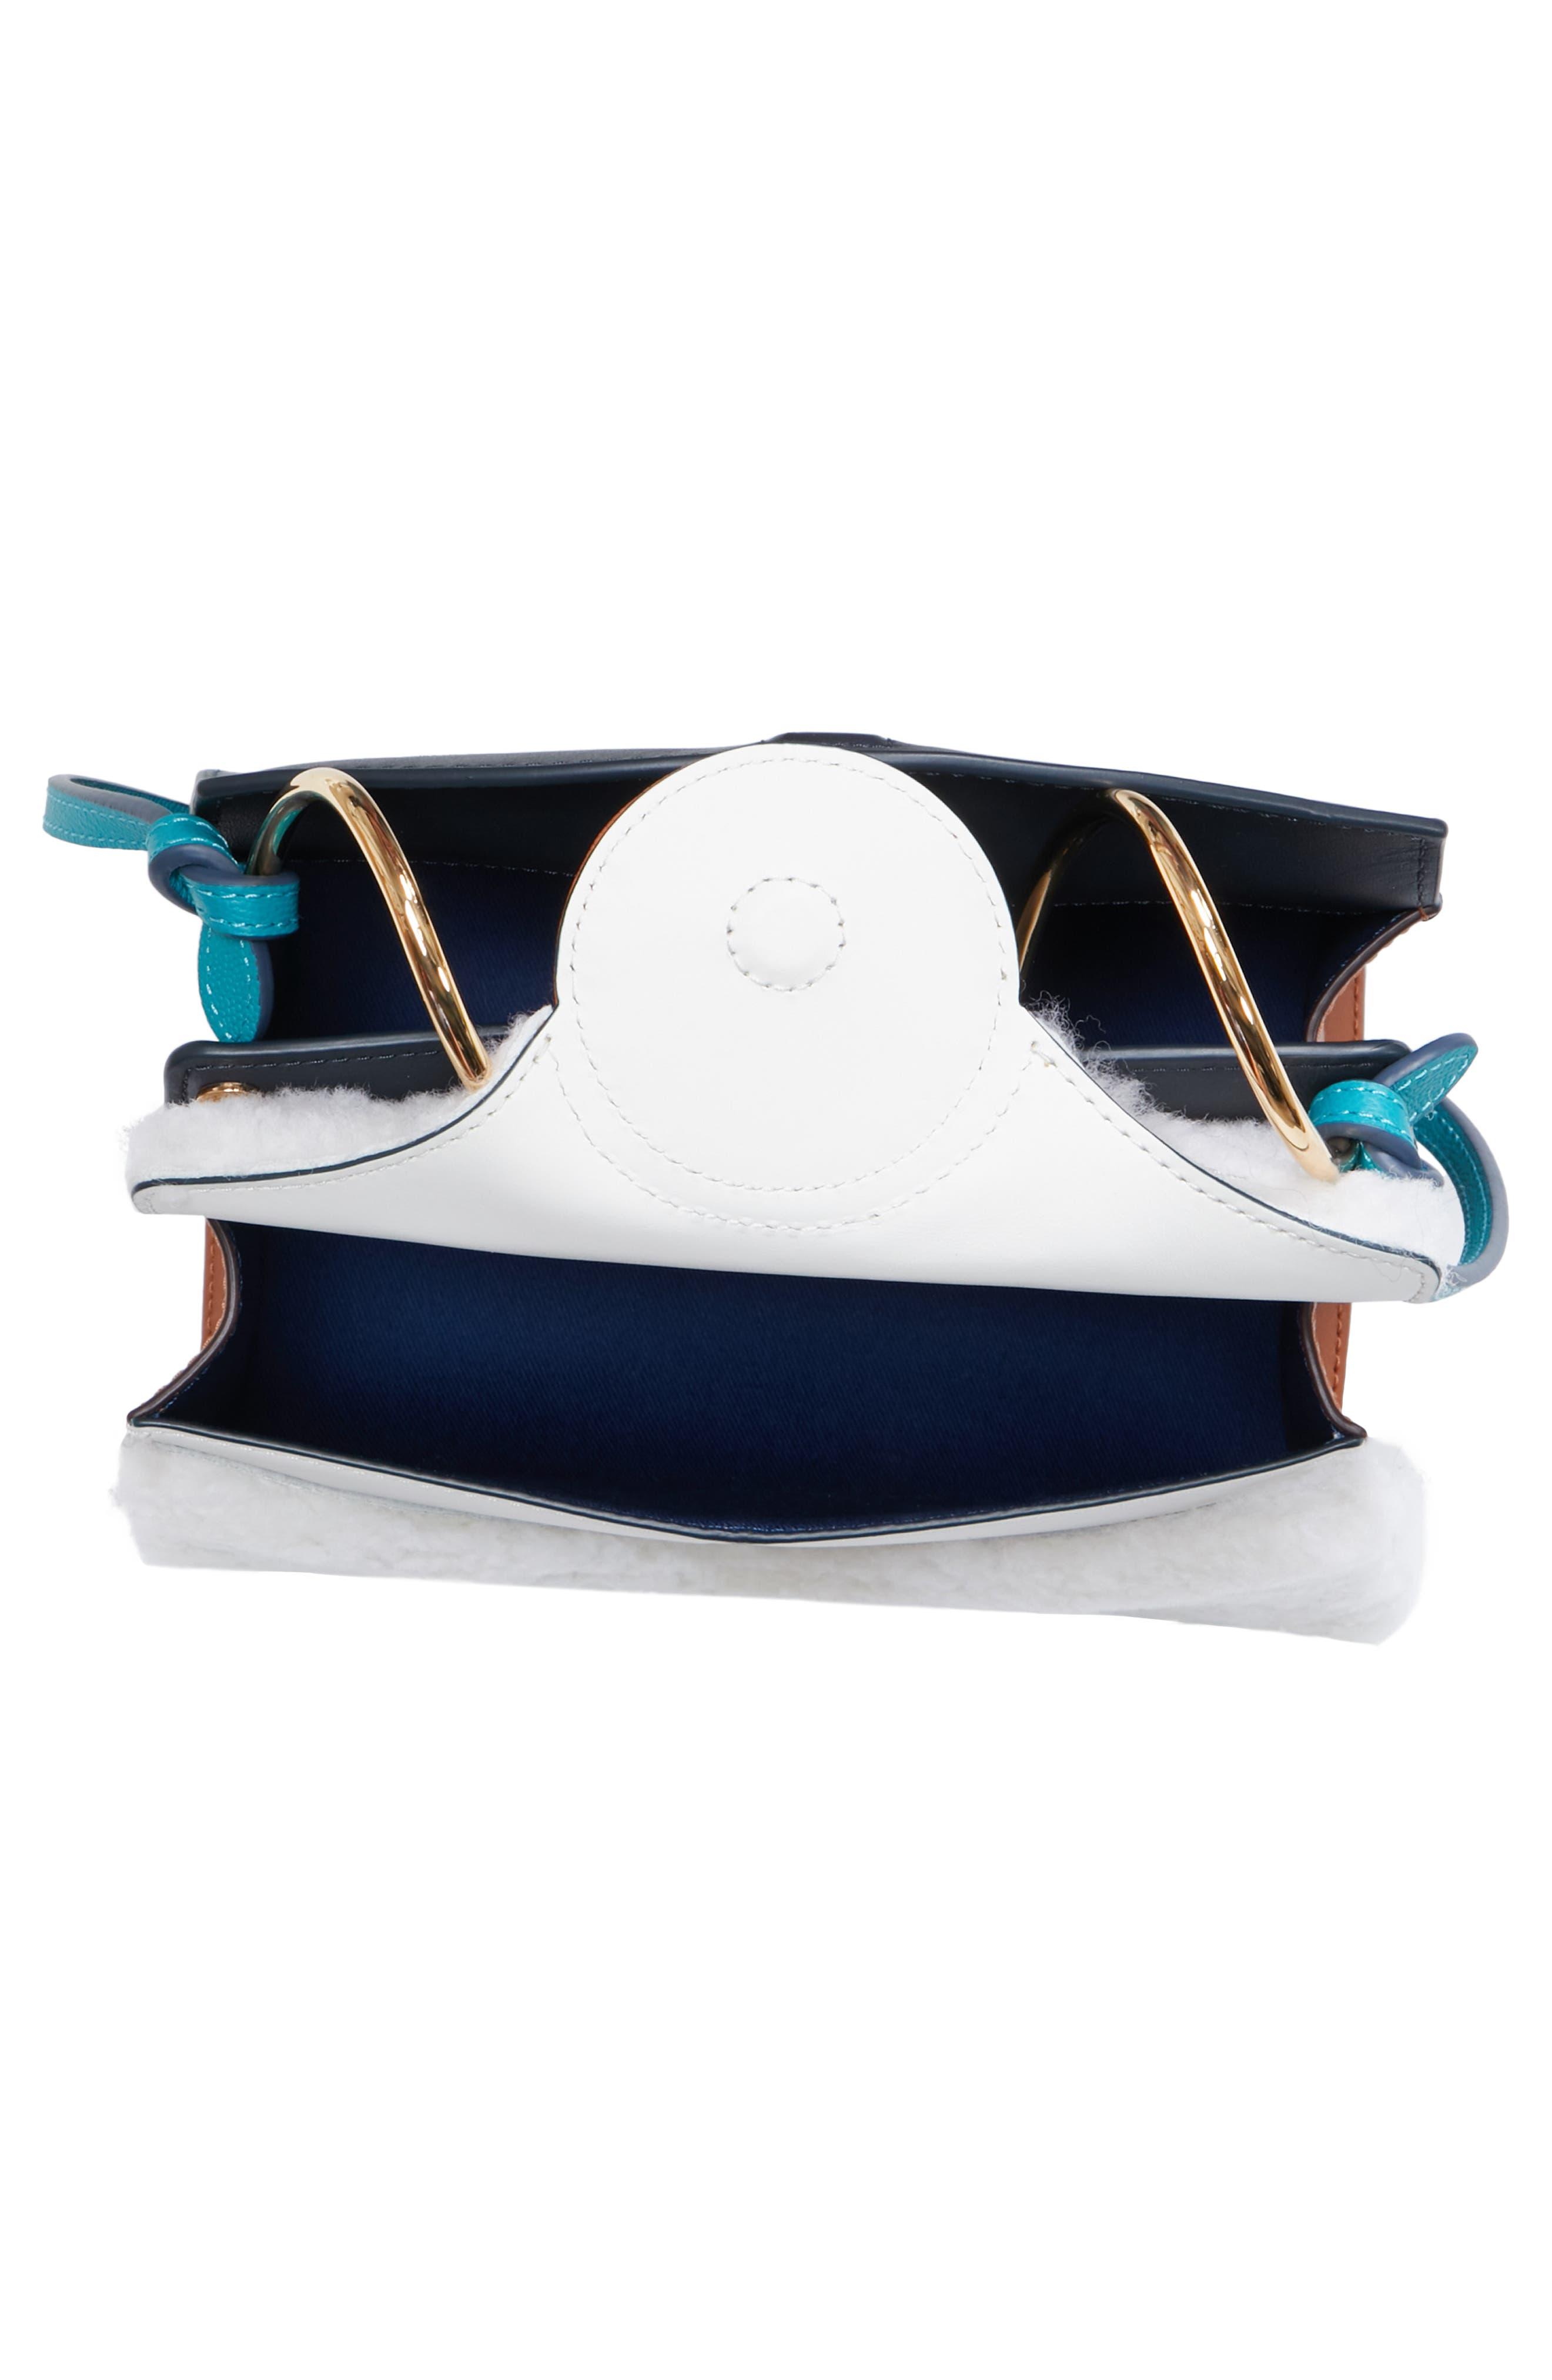 Mini Phoebe Leather Bag,                             Alternate thumbnail 4, color,                             CURLY SHEARLING WHITE-MARINE